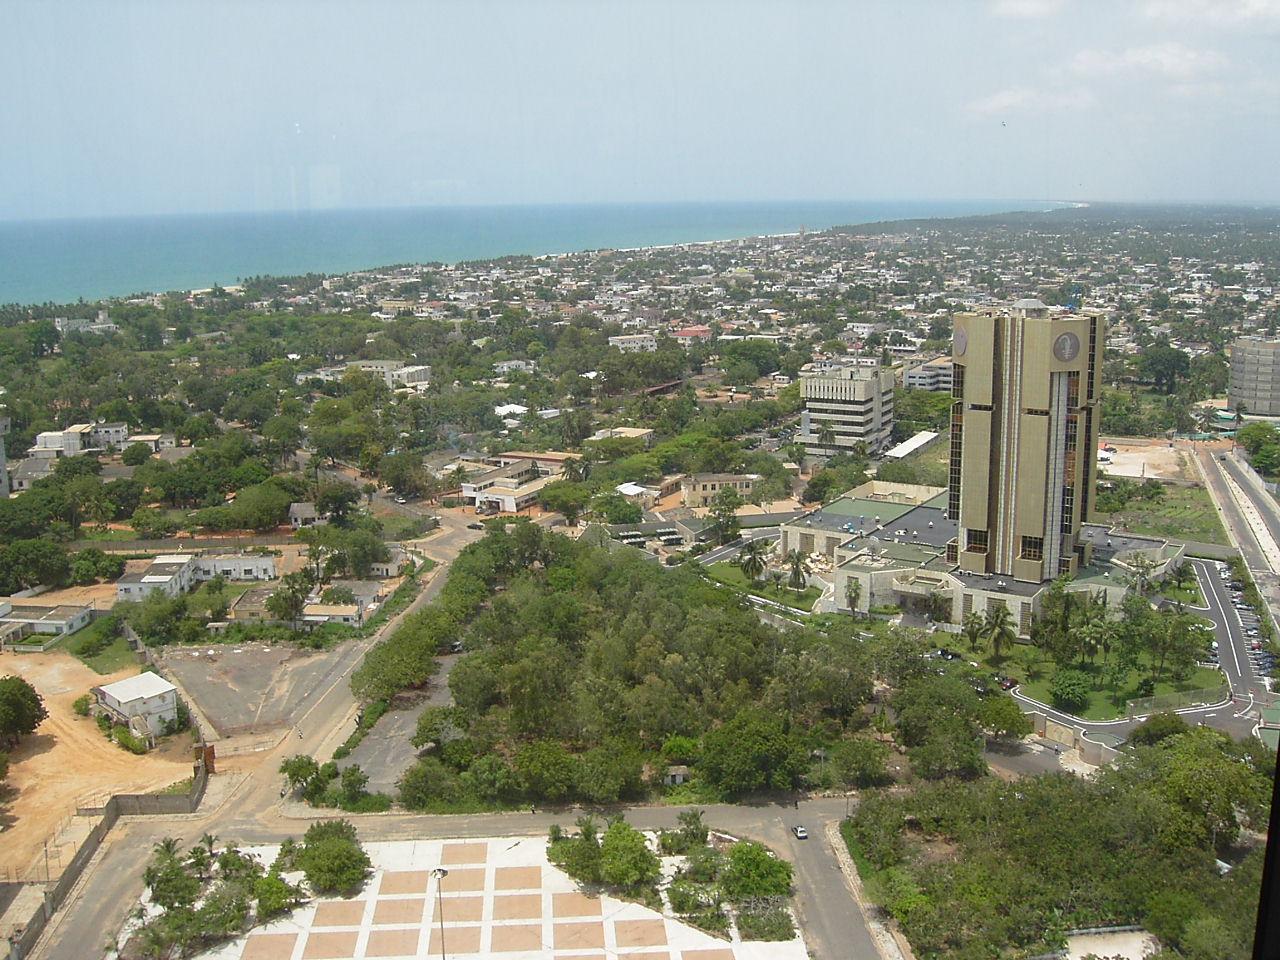 Quartier_des_administrations_(Lomé,_Togo